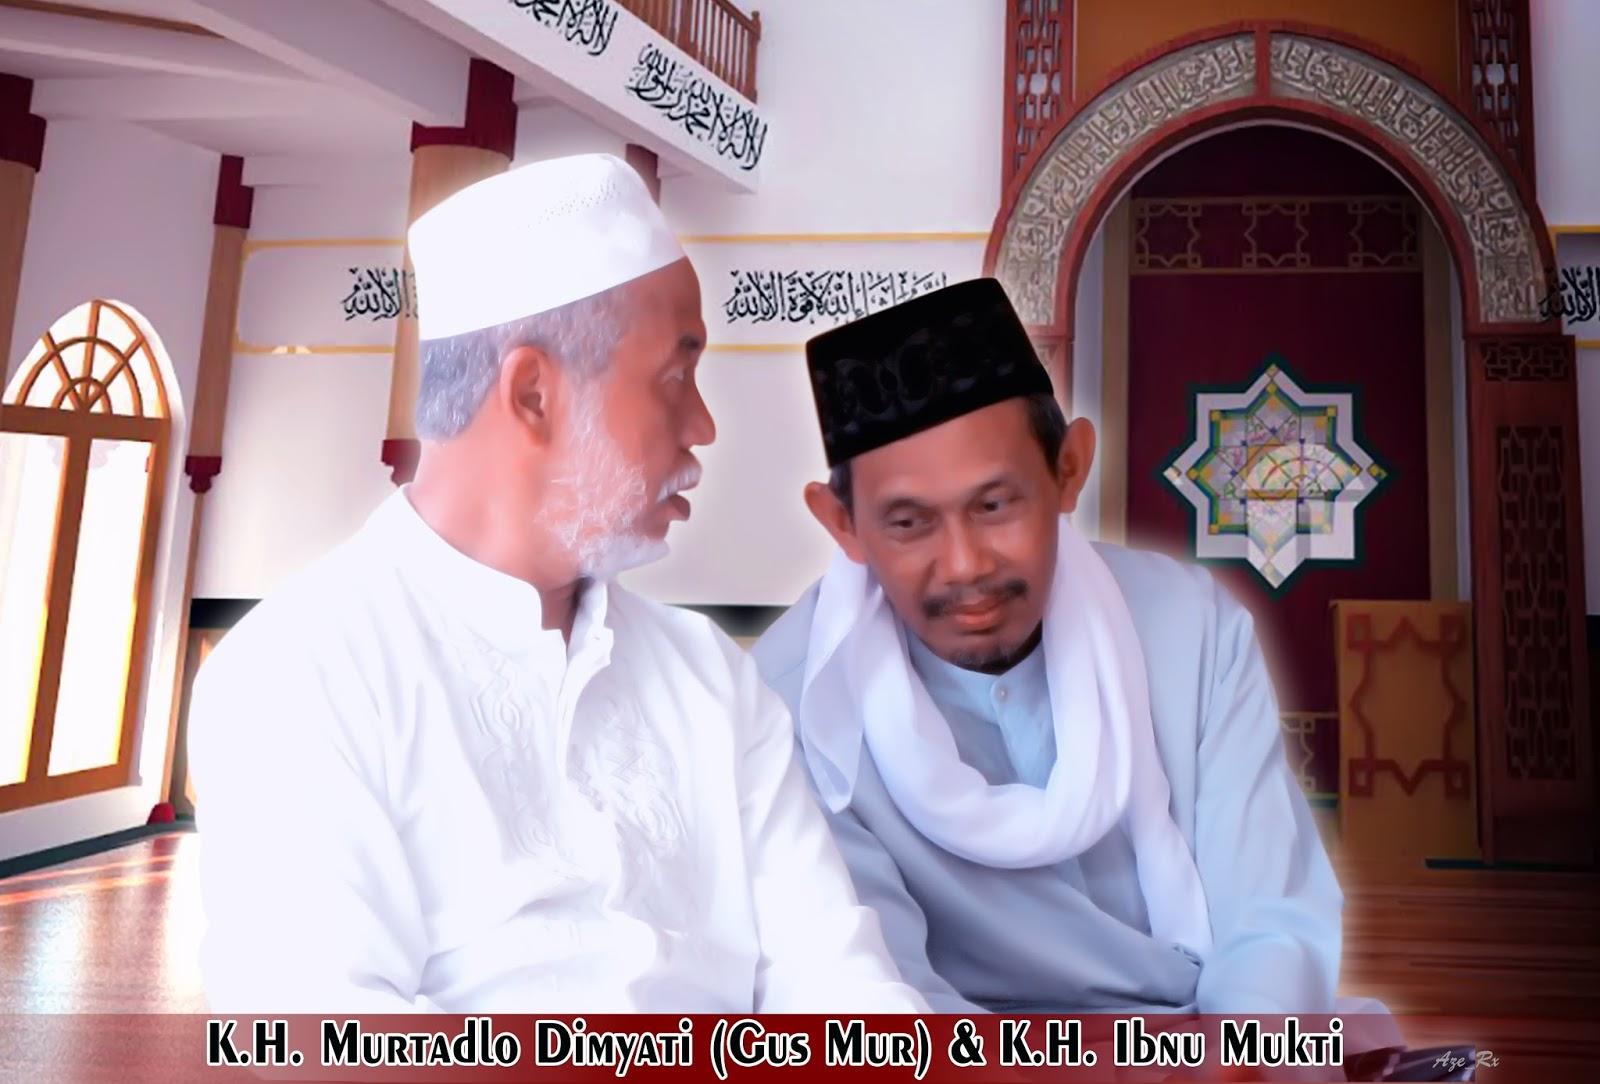 KH Ibnu Mukti dan KH Murtadho Dimyati